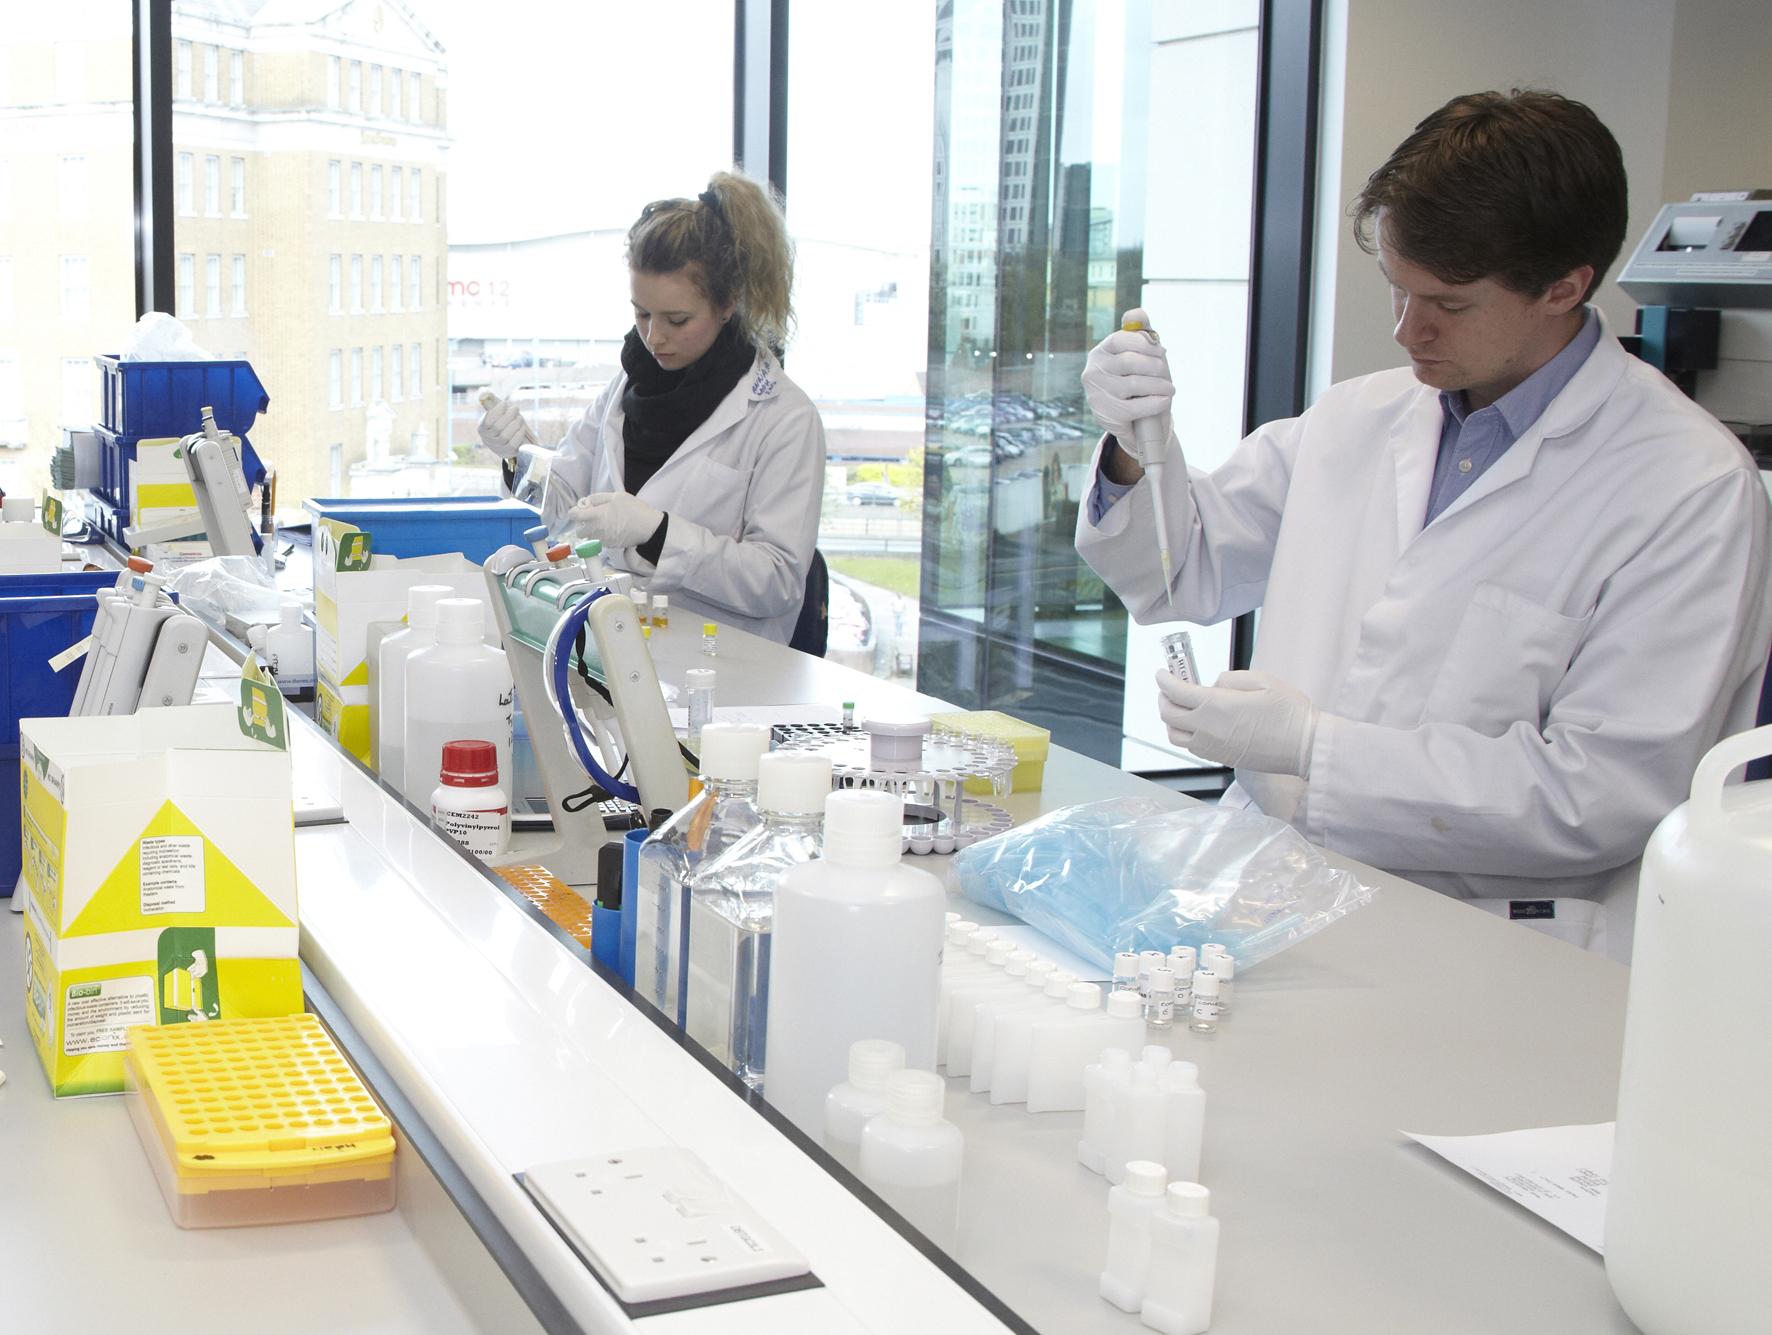 Hangi Laboratuvar Daha Güvenli